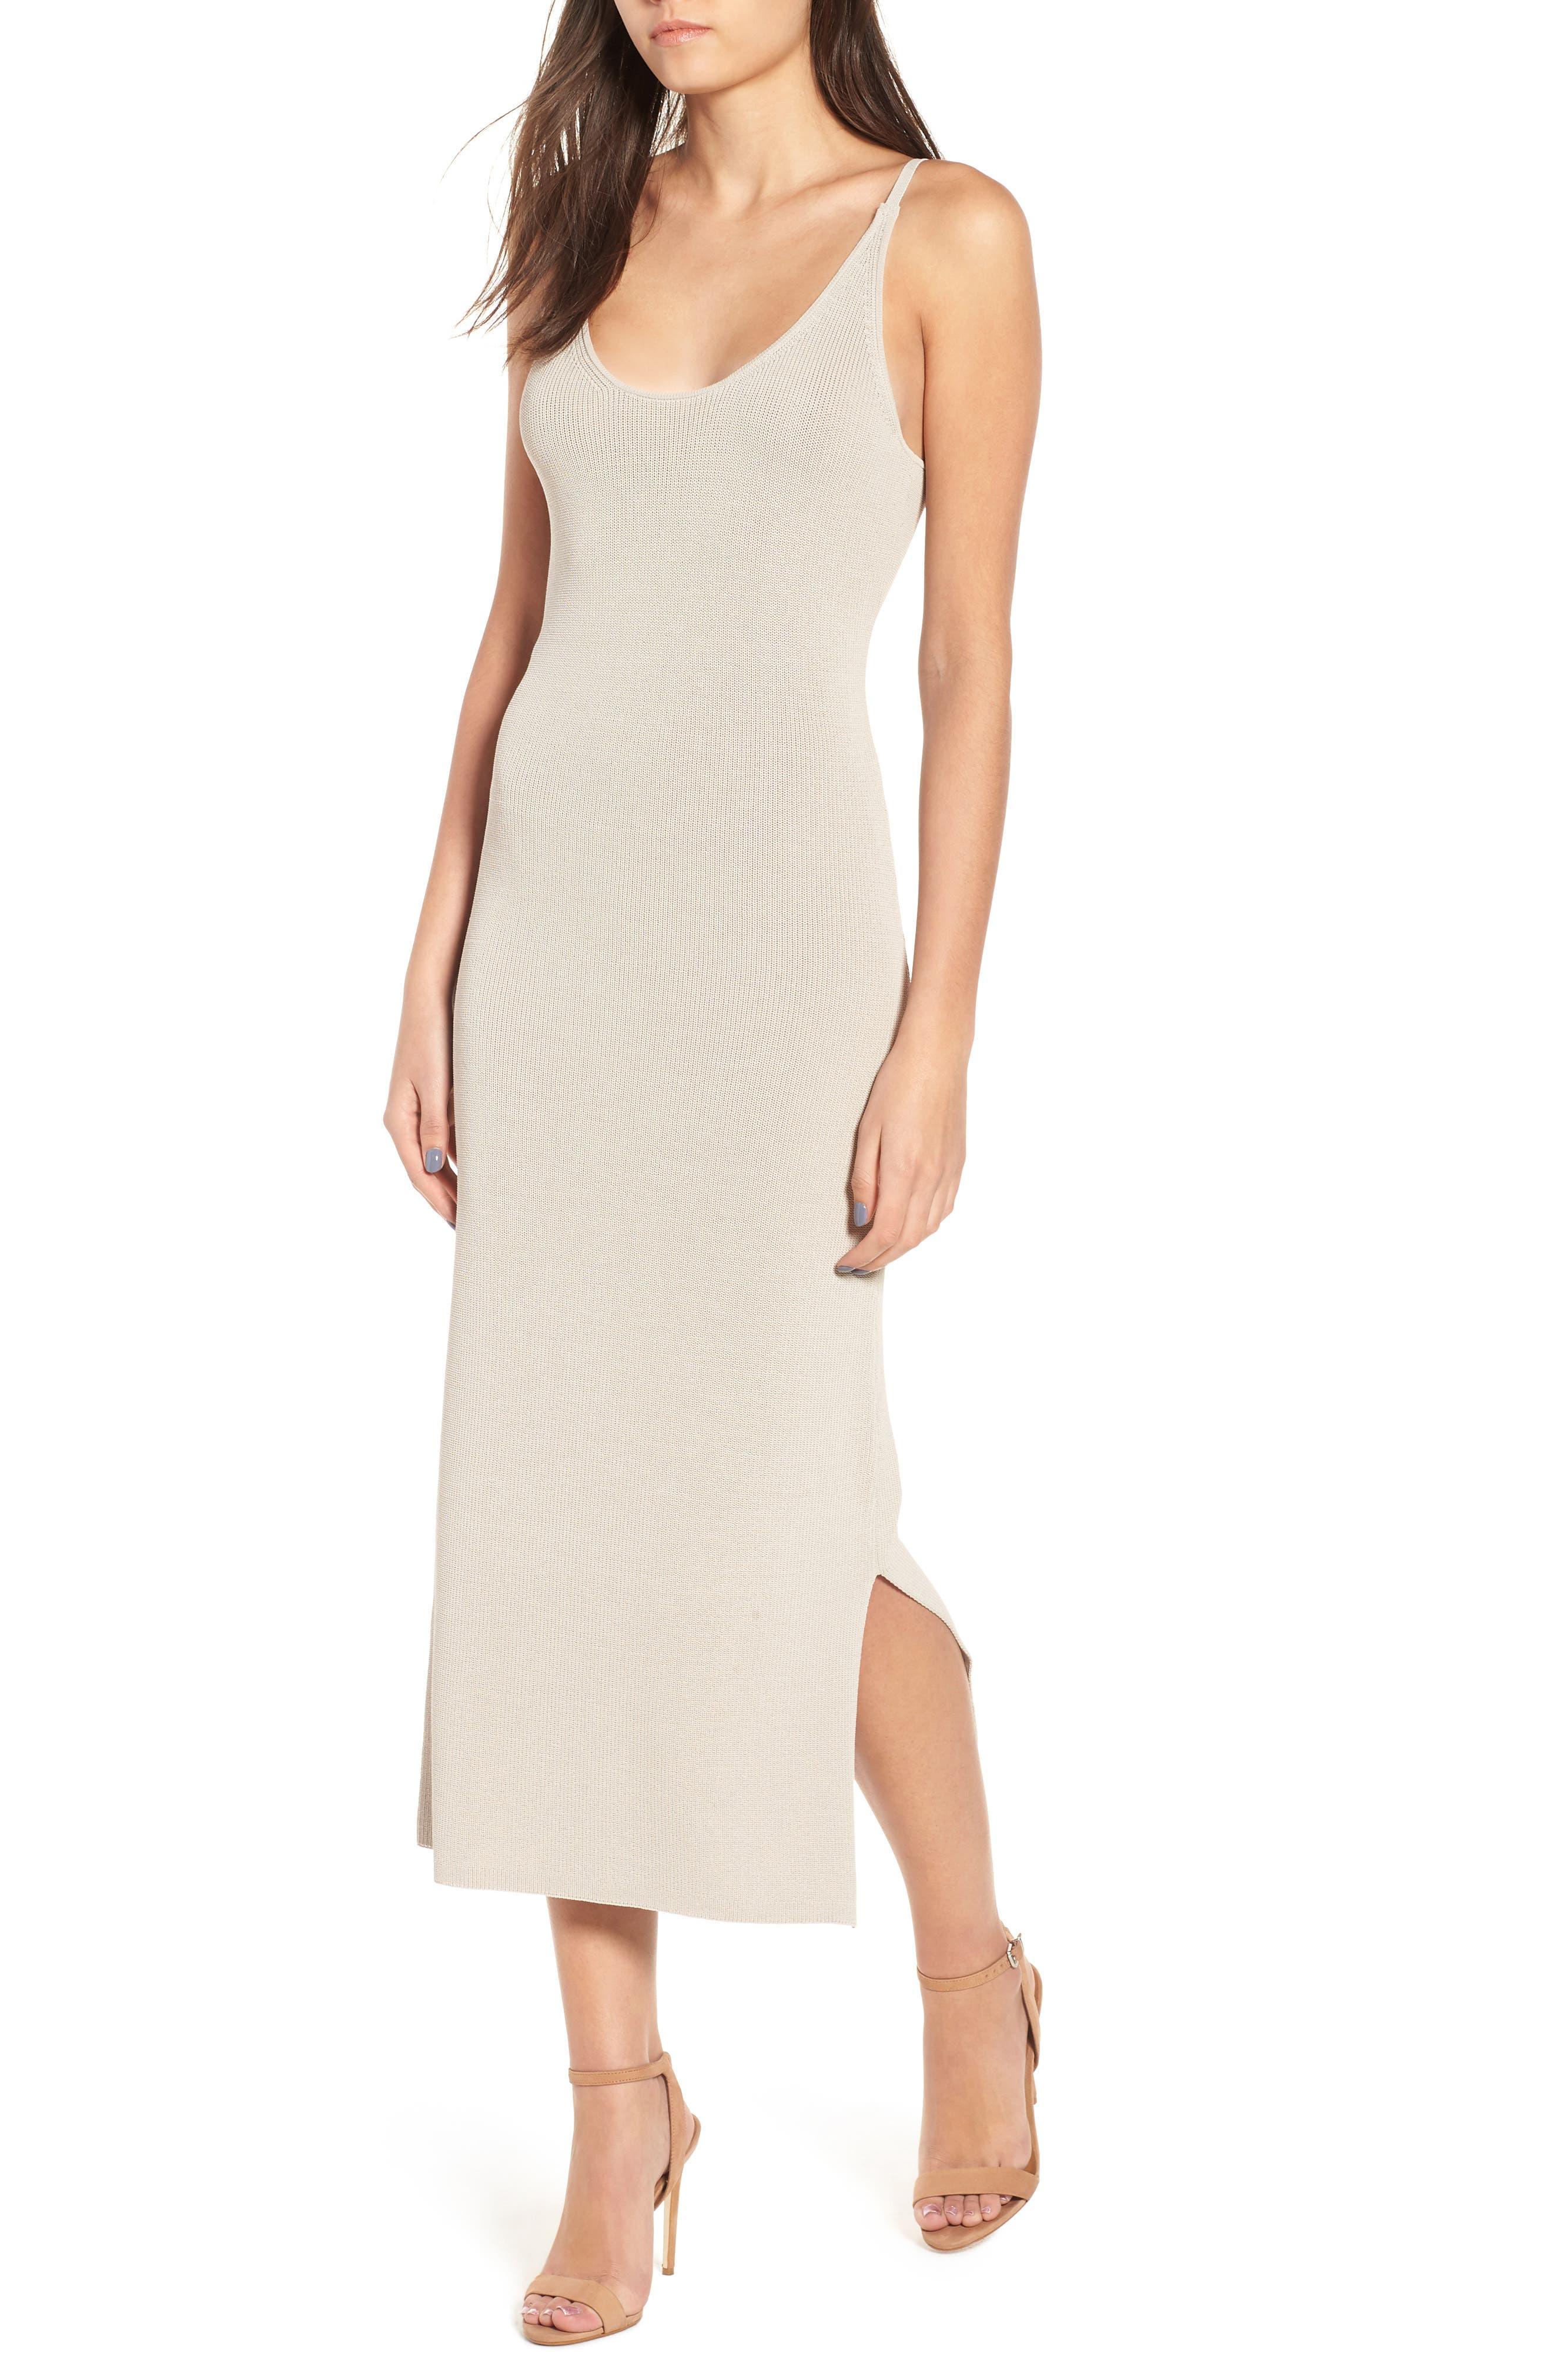 Sweater Strap Dress,                         Main,                         color, 050